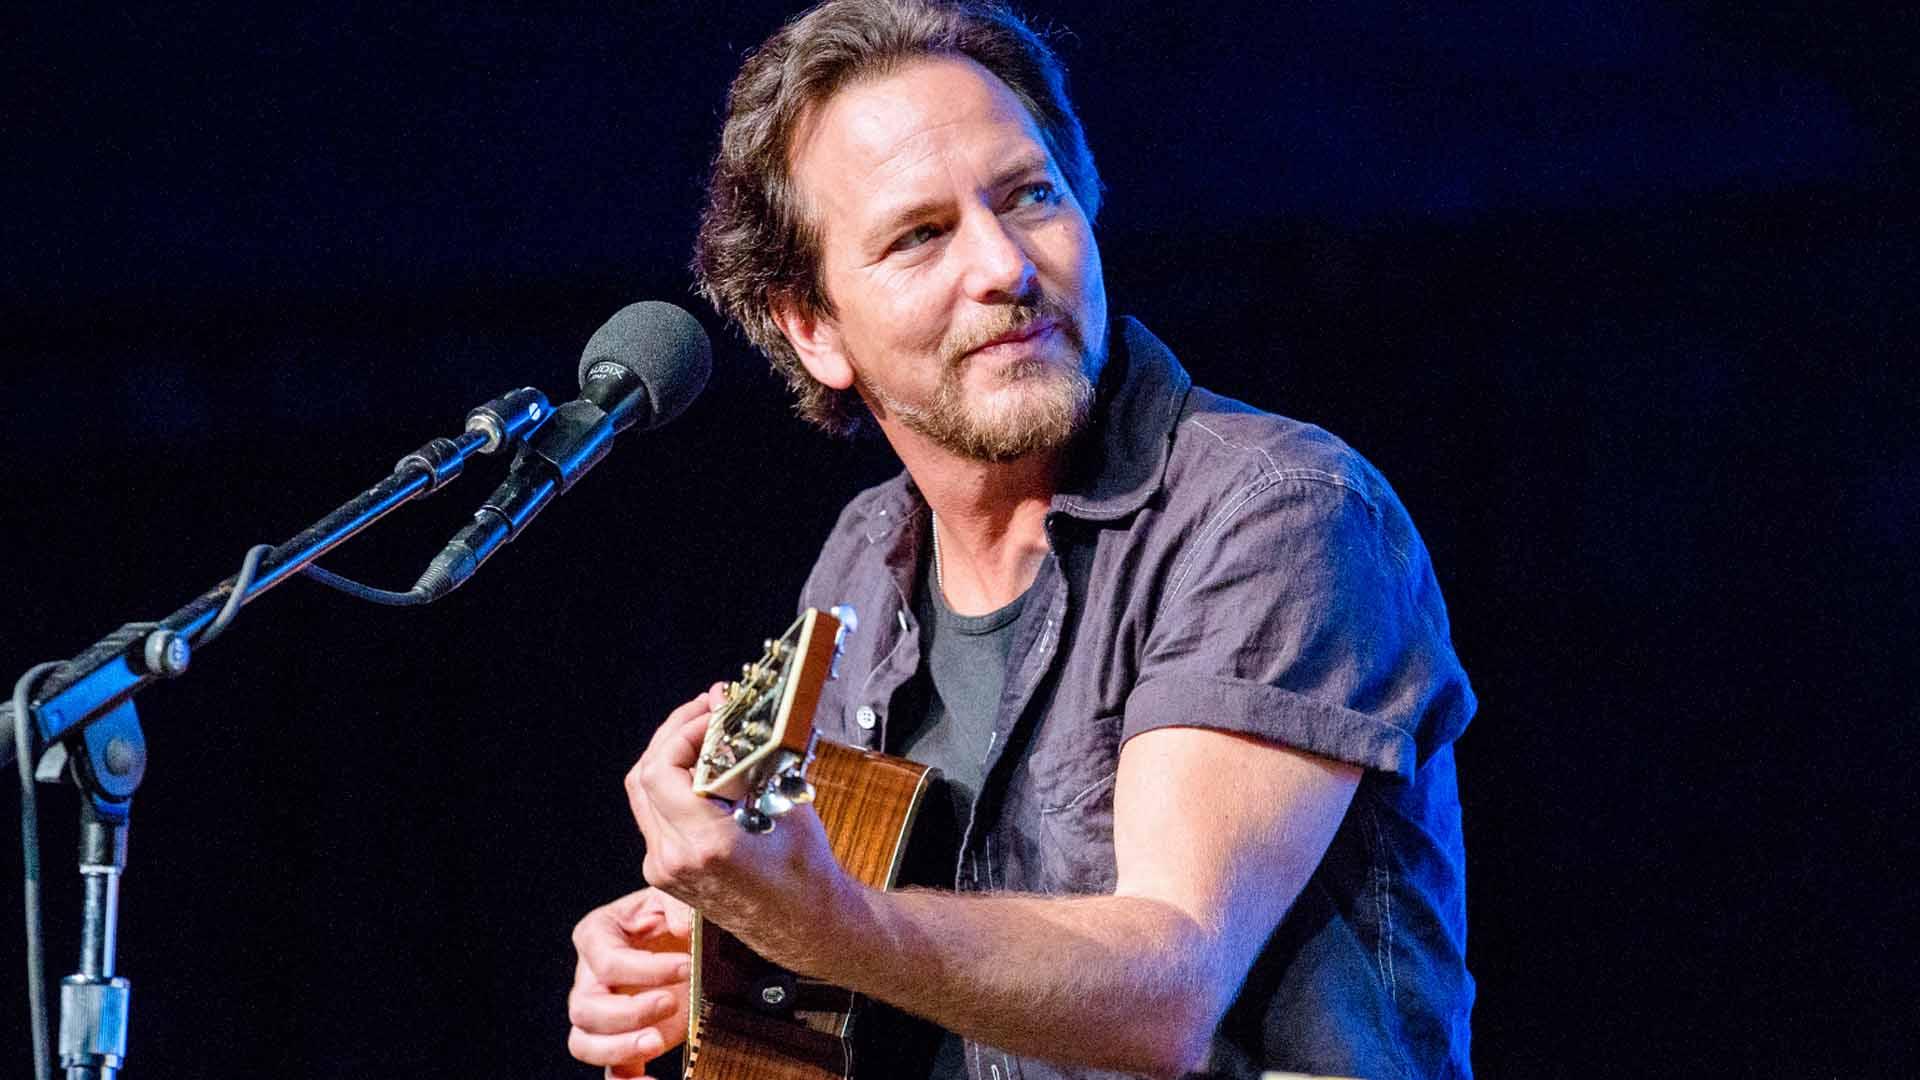 Quando Eddie Vedder improvvisò una cover band a Groningen